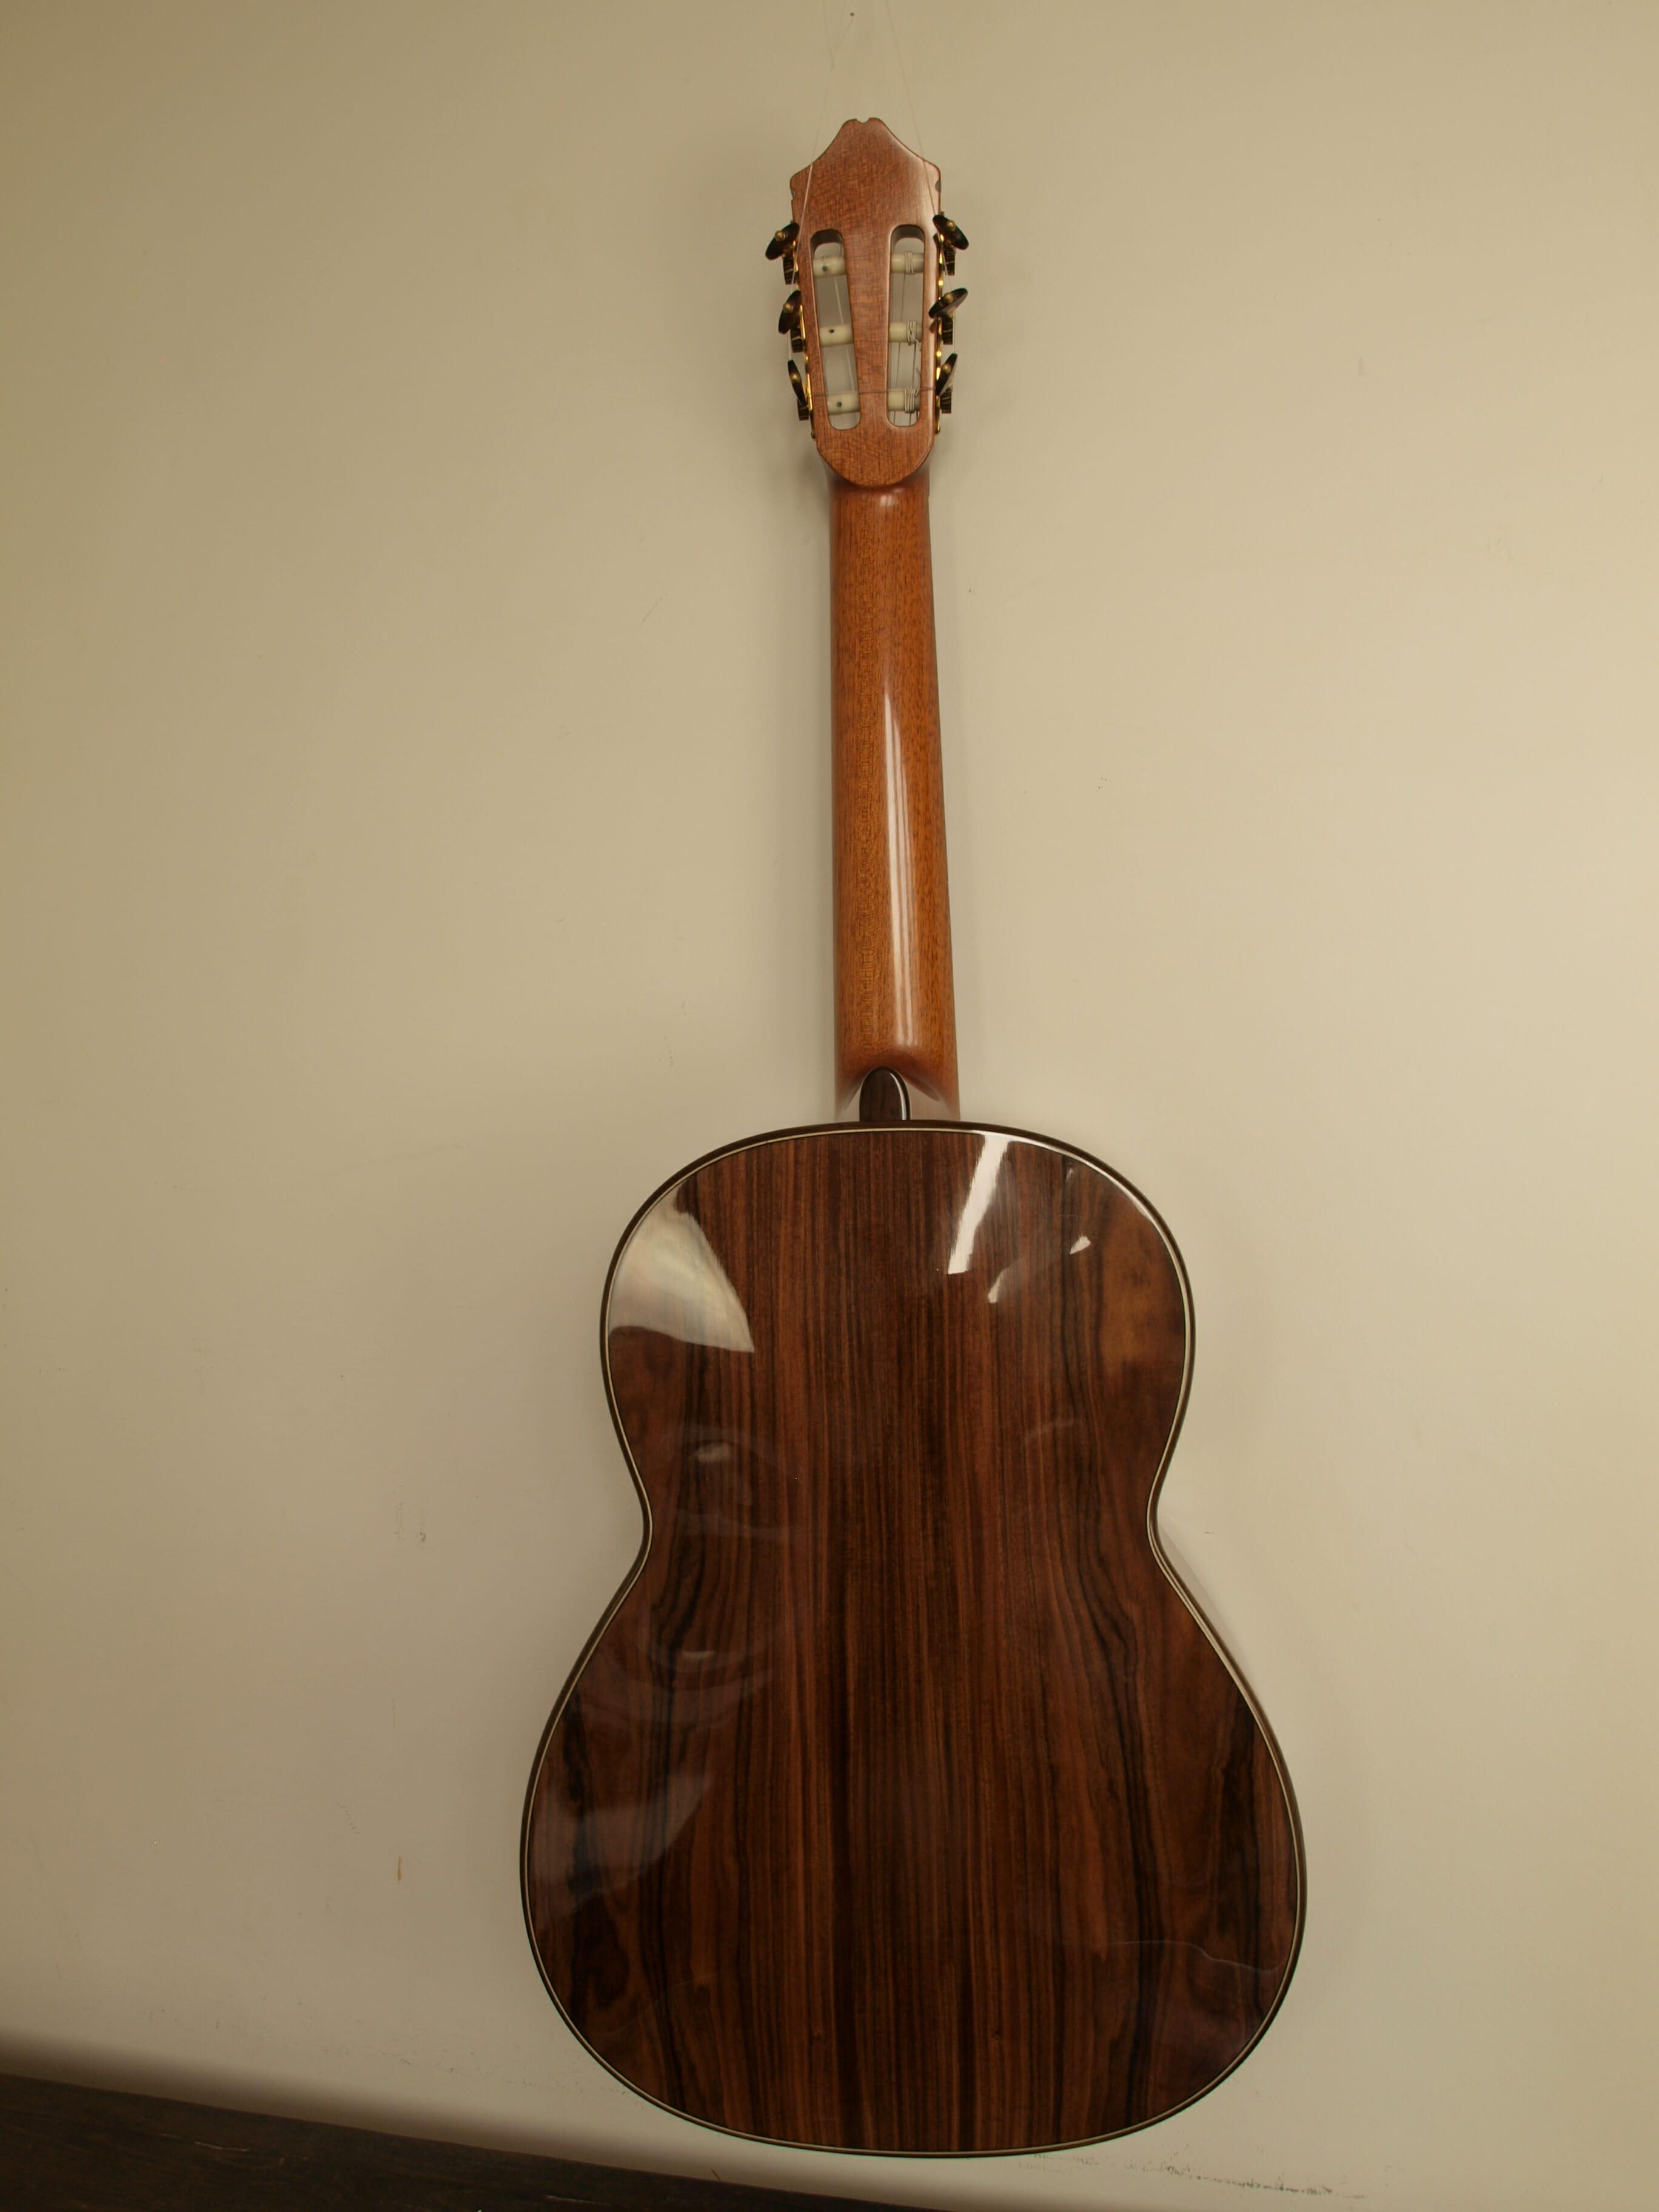 Greg Smallman guitare classique luthier lattice 2010